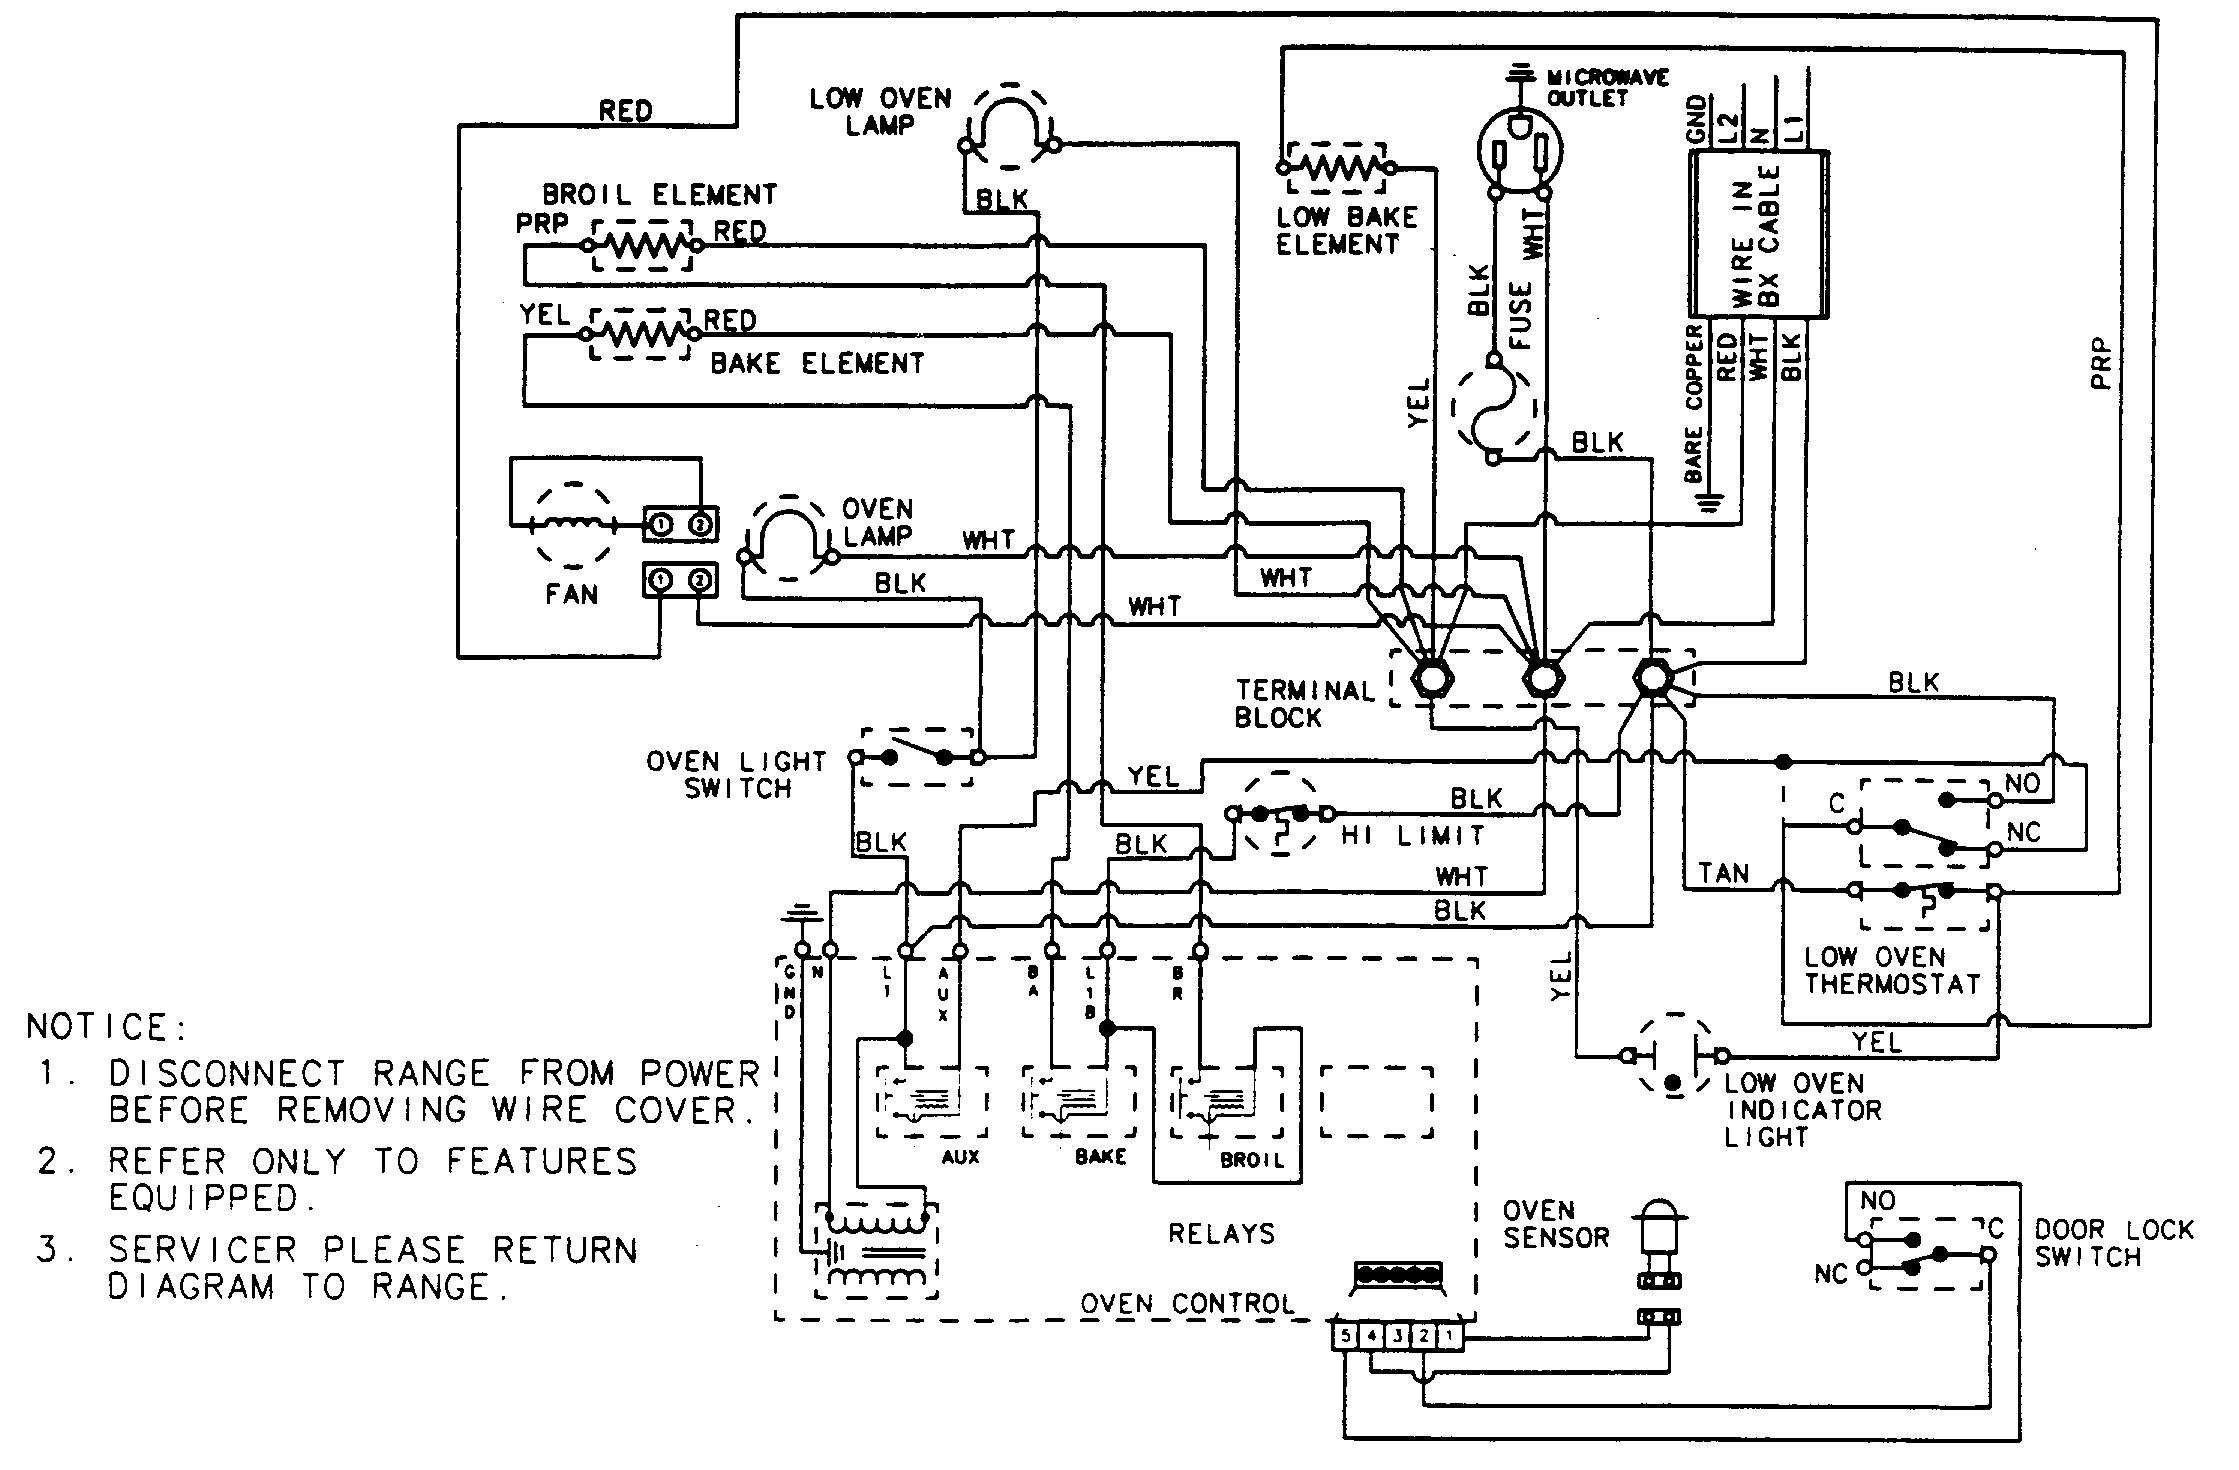 240v wiring diagram baking element wiring diagram 240V 3 Phase Wiring Diagram 1960 westinghouse wall ovens wiring diagram detailed wiring diagram 240v wiring diagram baking element